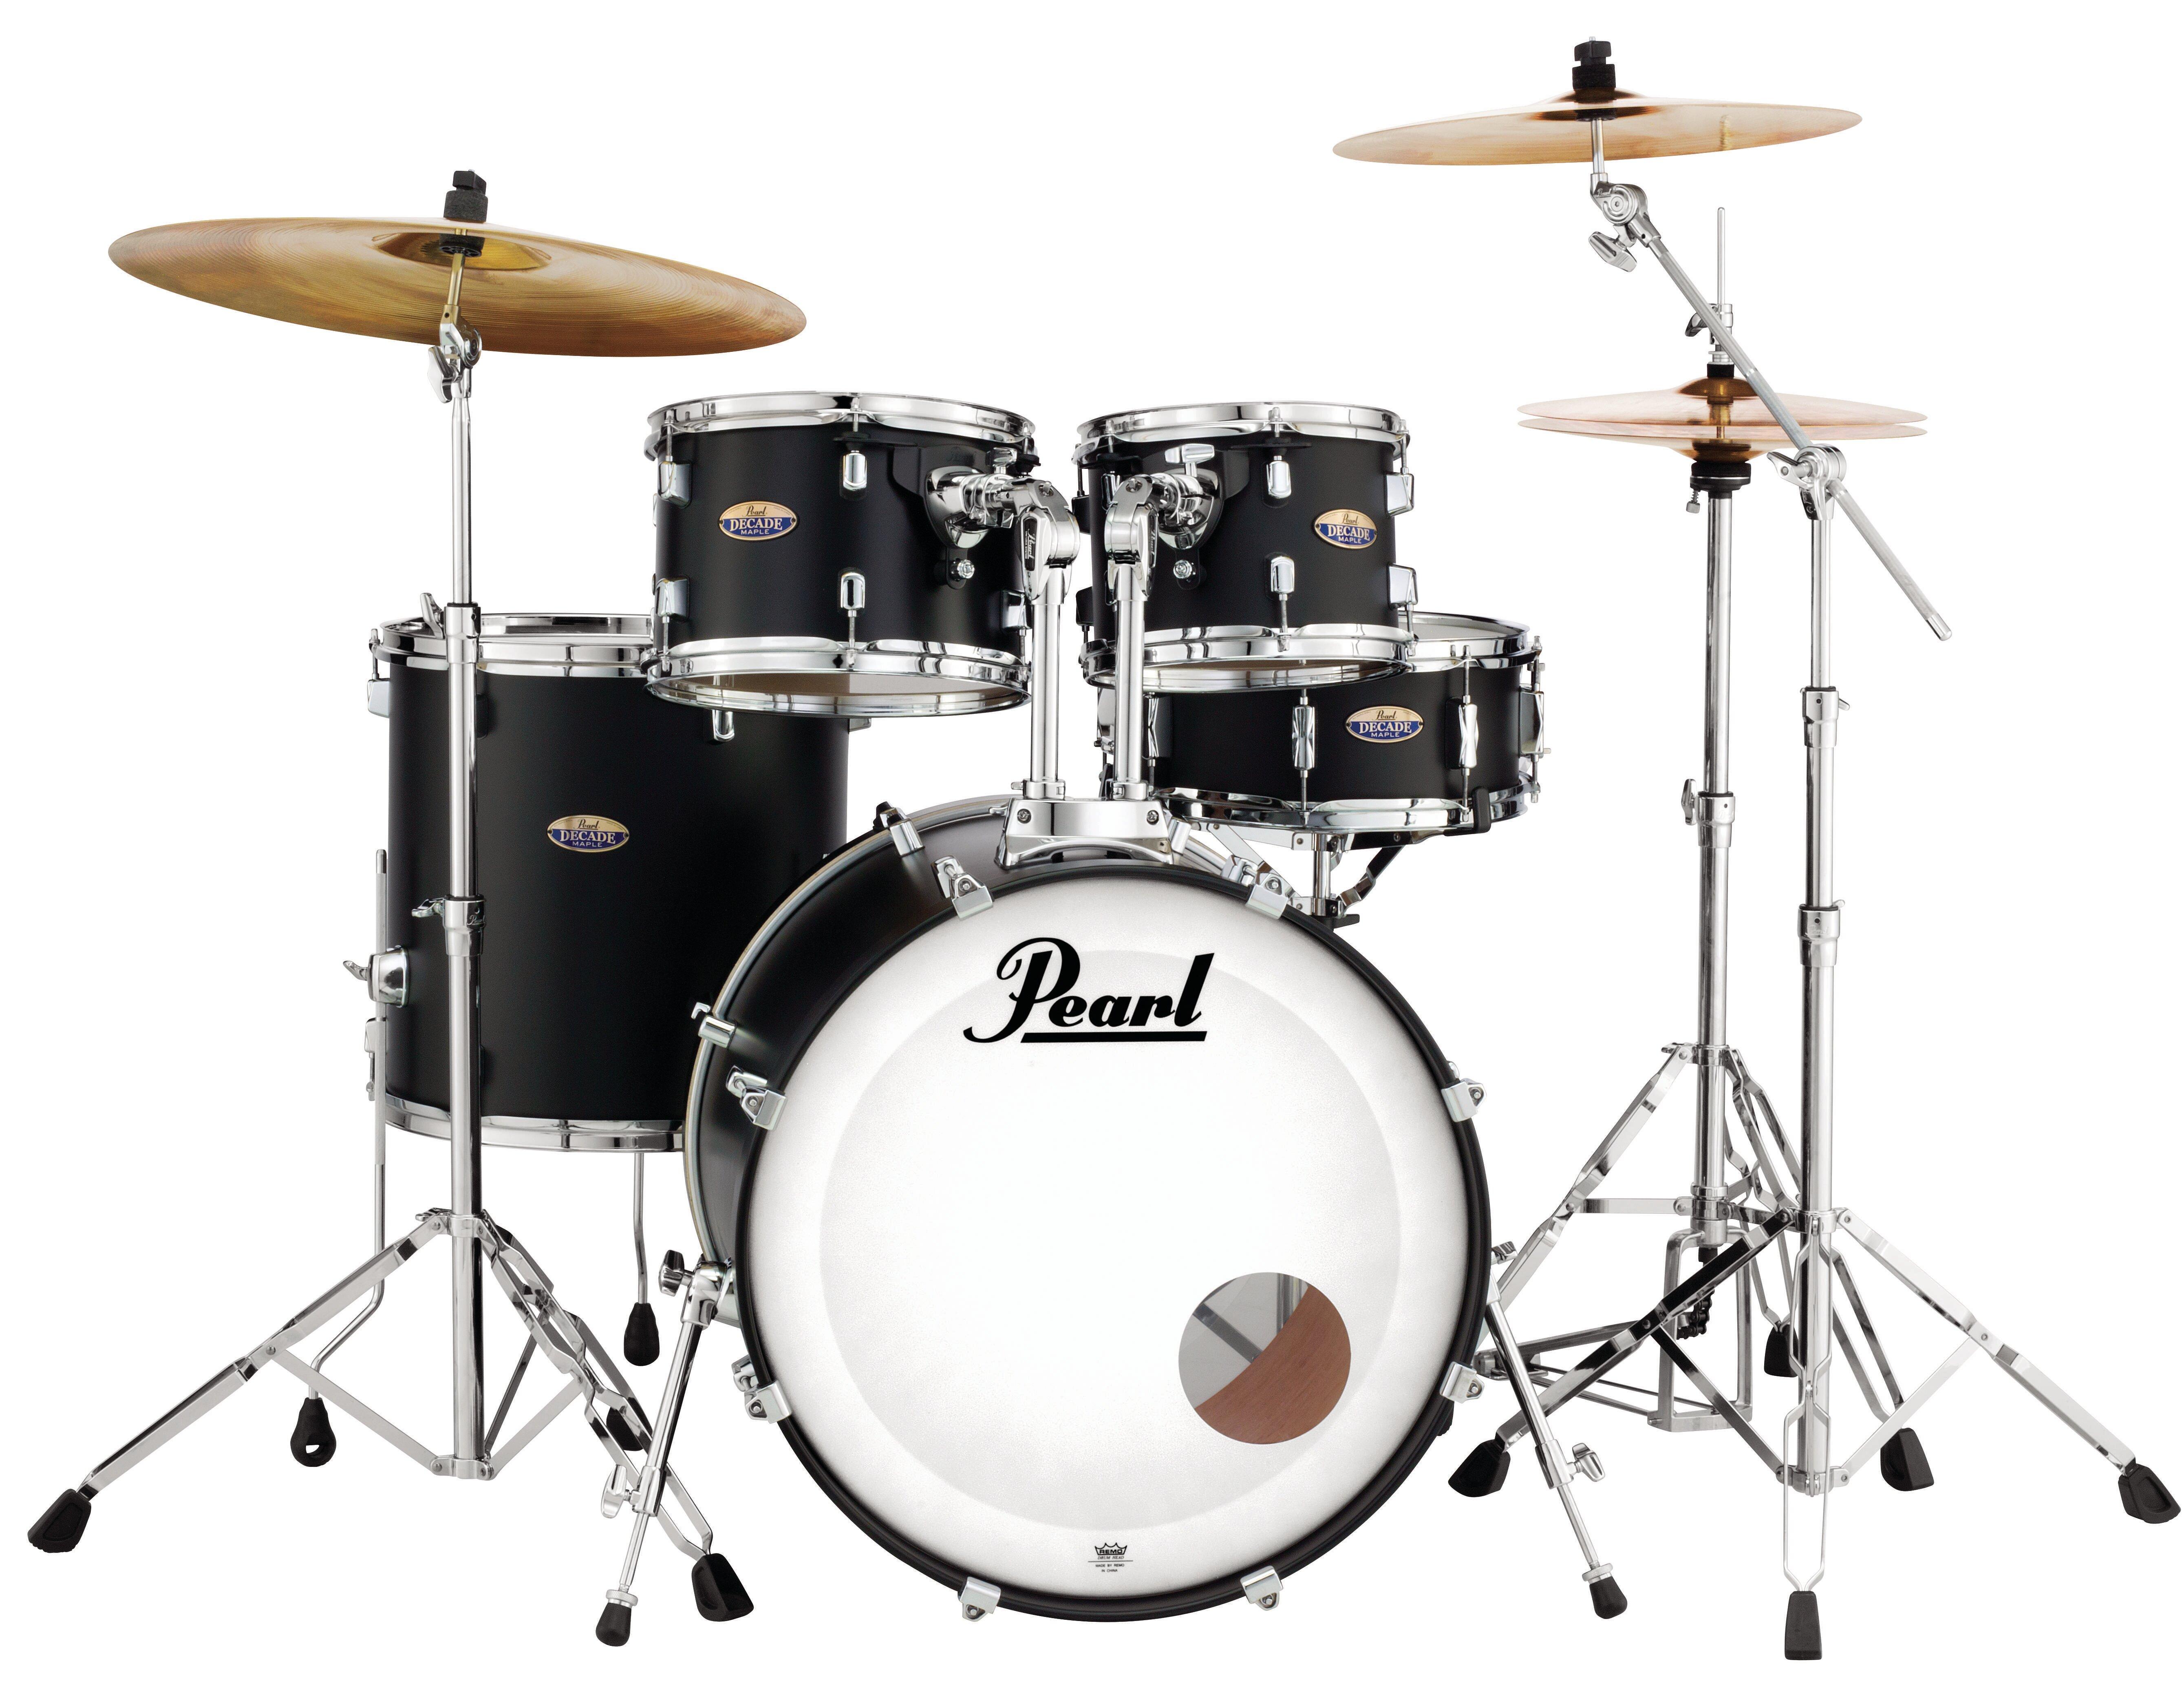 Барабанная установка pearl dmp925f/c227